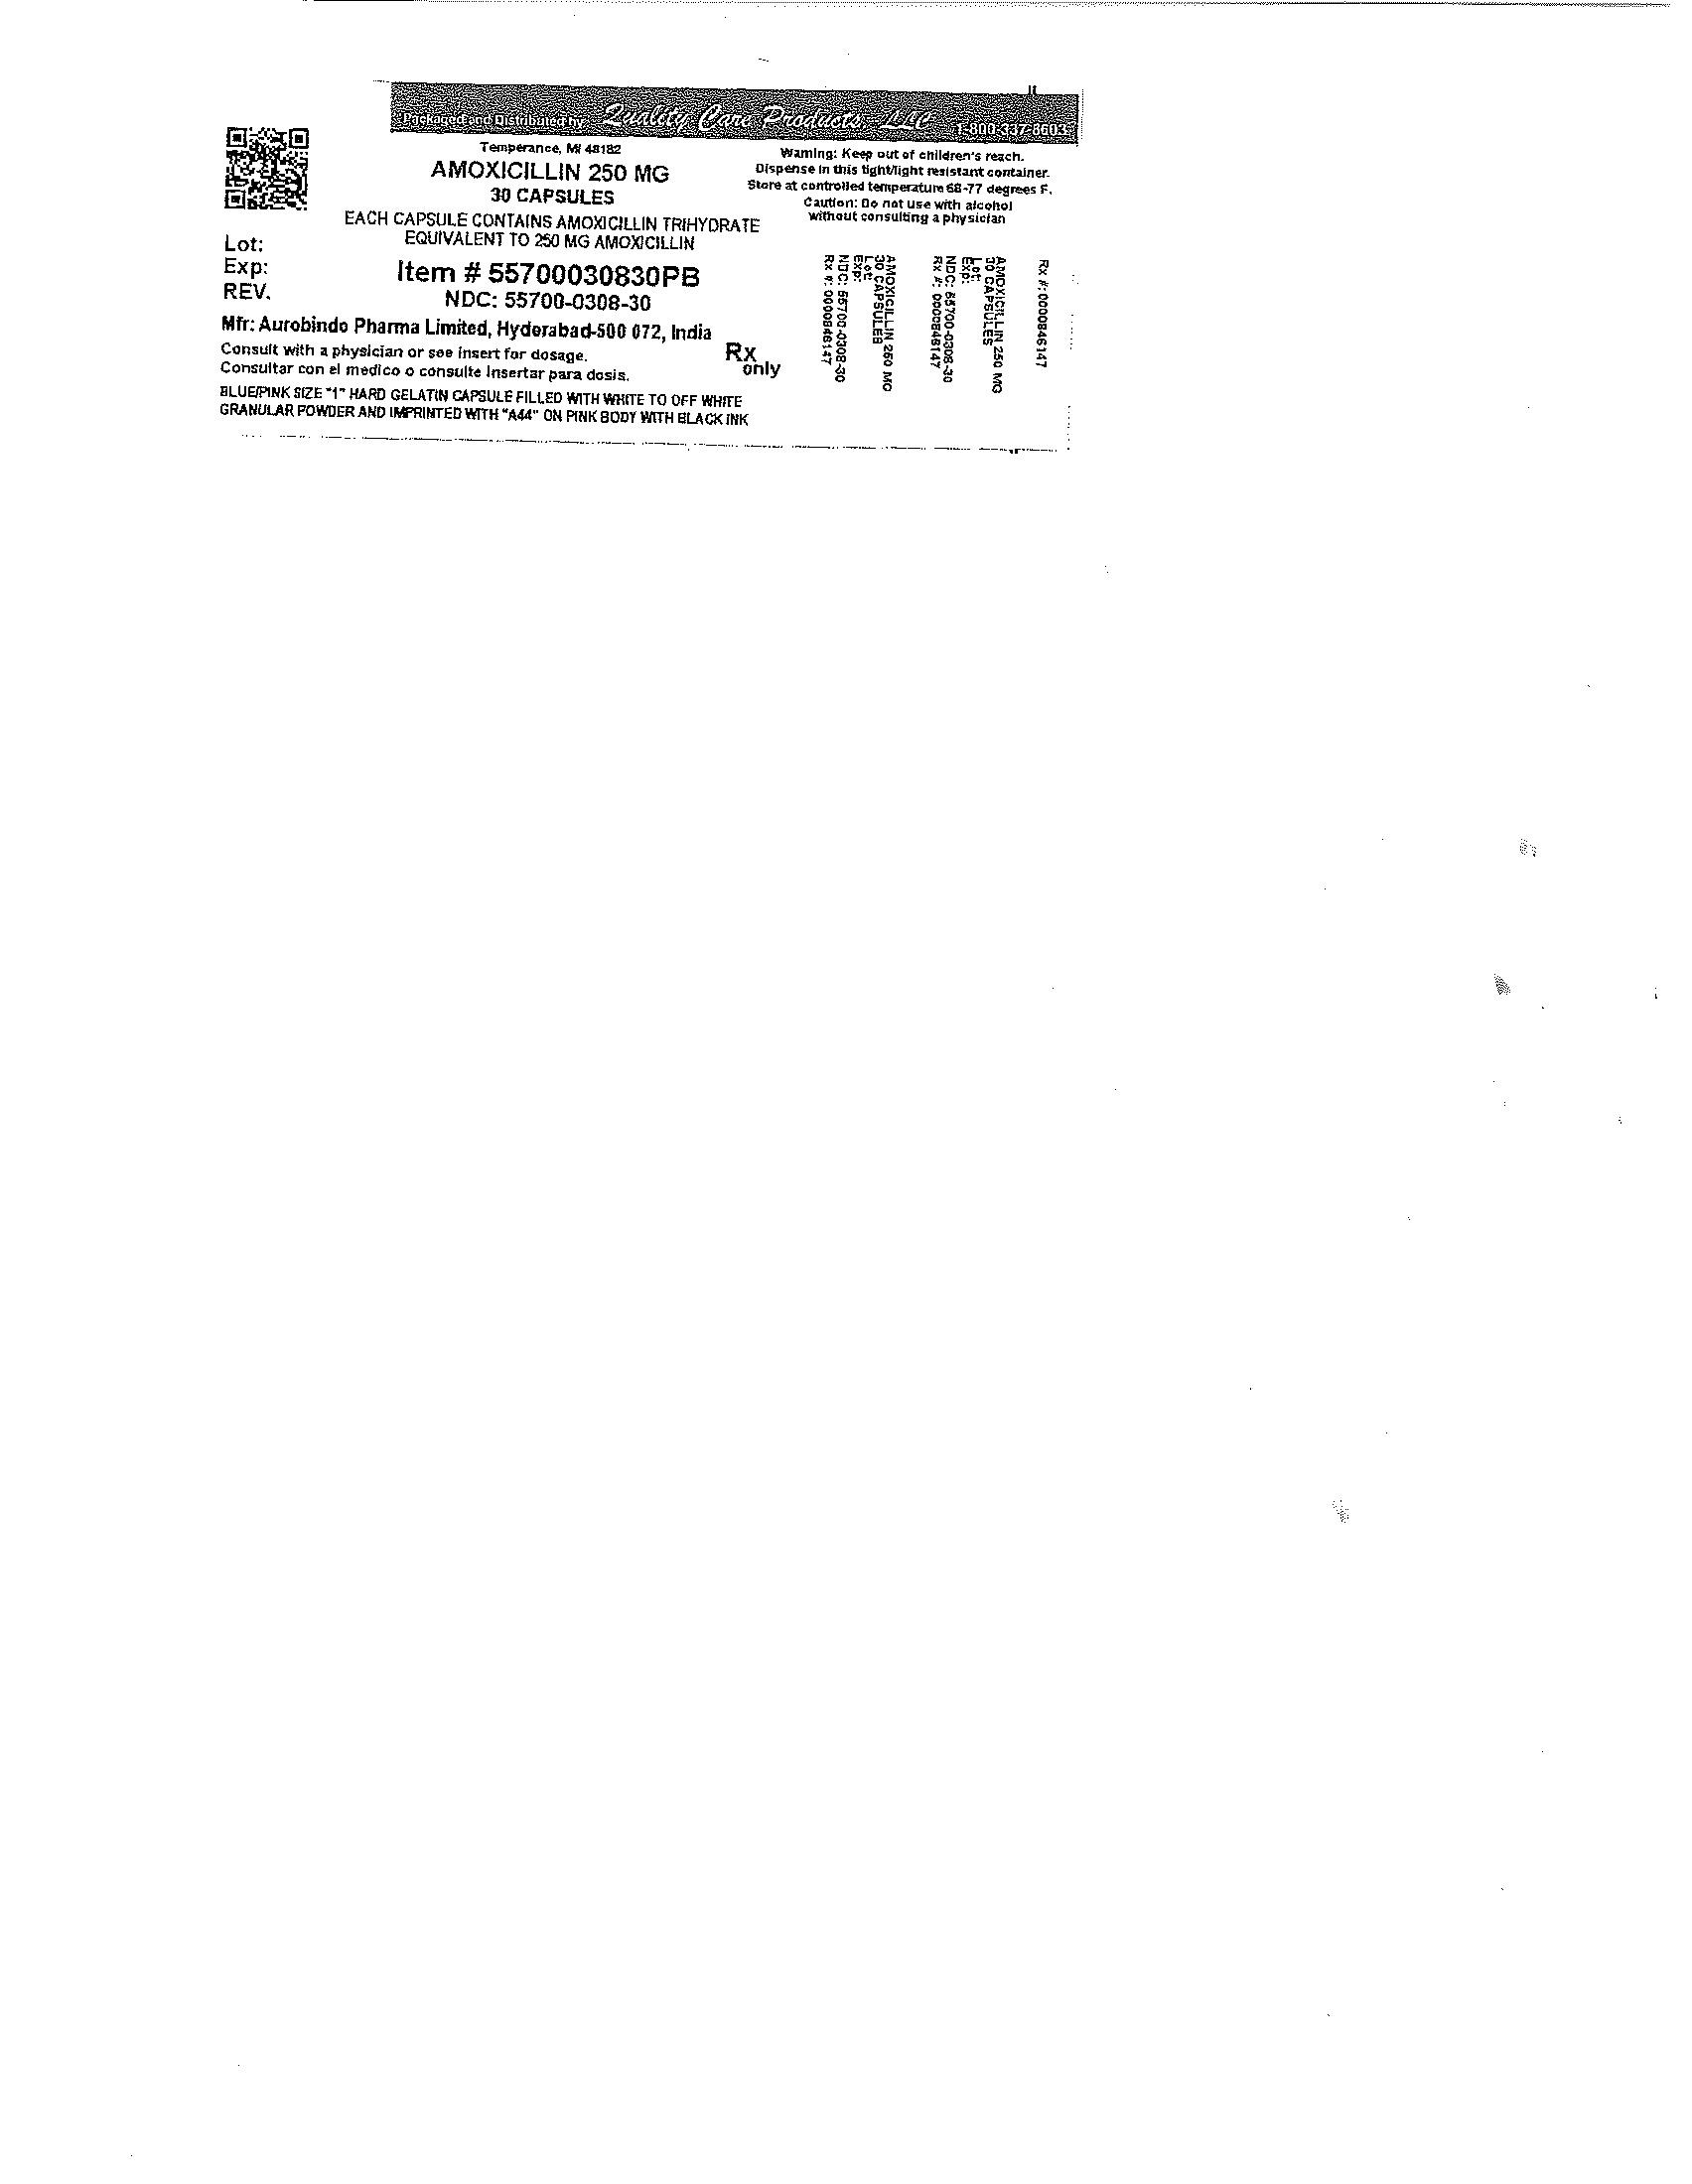 Amoxicillin   Lake Erie Medical Dba Quality Care Products Llc while Breastfeeding